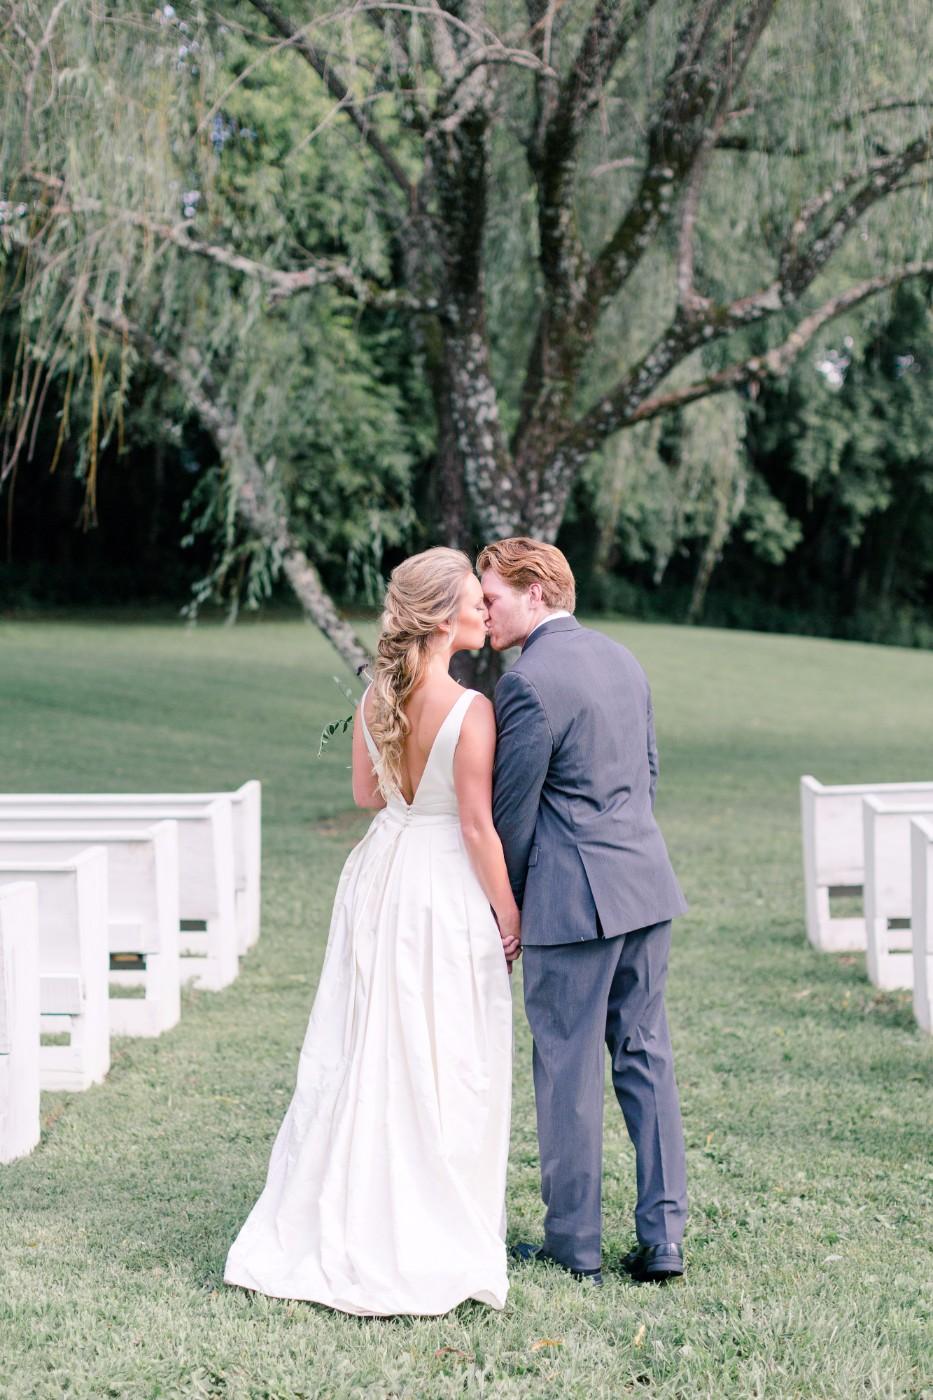 Sacred-Stone-Wedding-Mauve-Shoot-Ais-Portraits-27.jpg